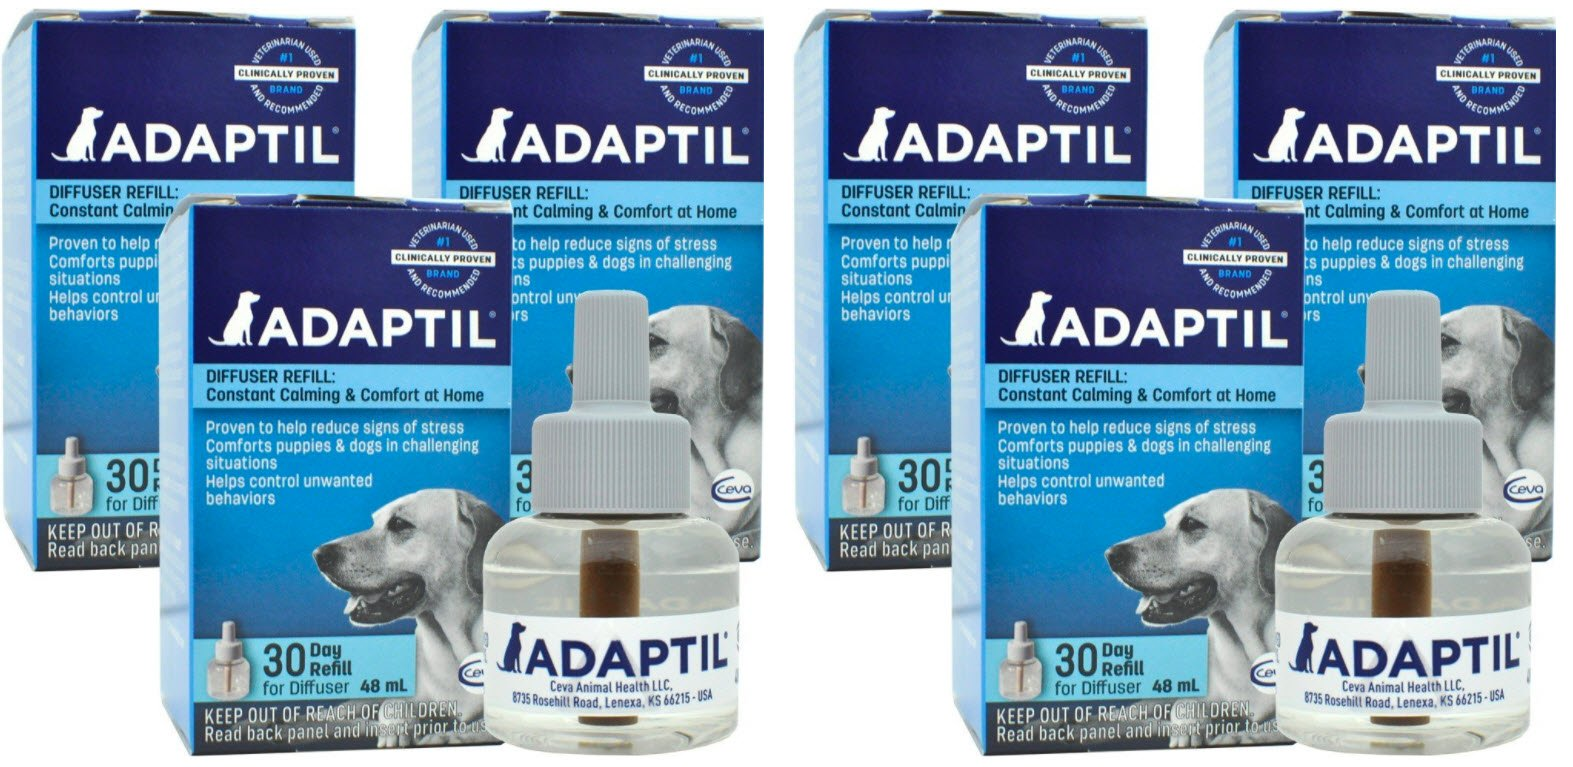 ADAPTIL (D.A.P.) Dog Appeasing Pheromone Refill (144mL) (6-Pack) by DAP